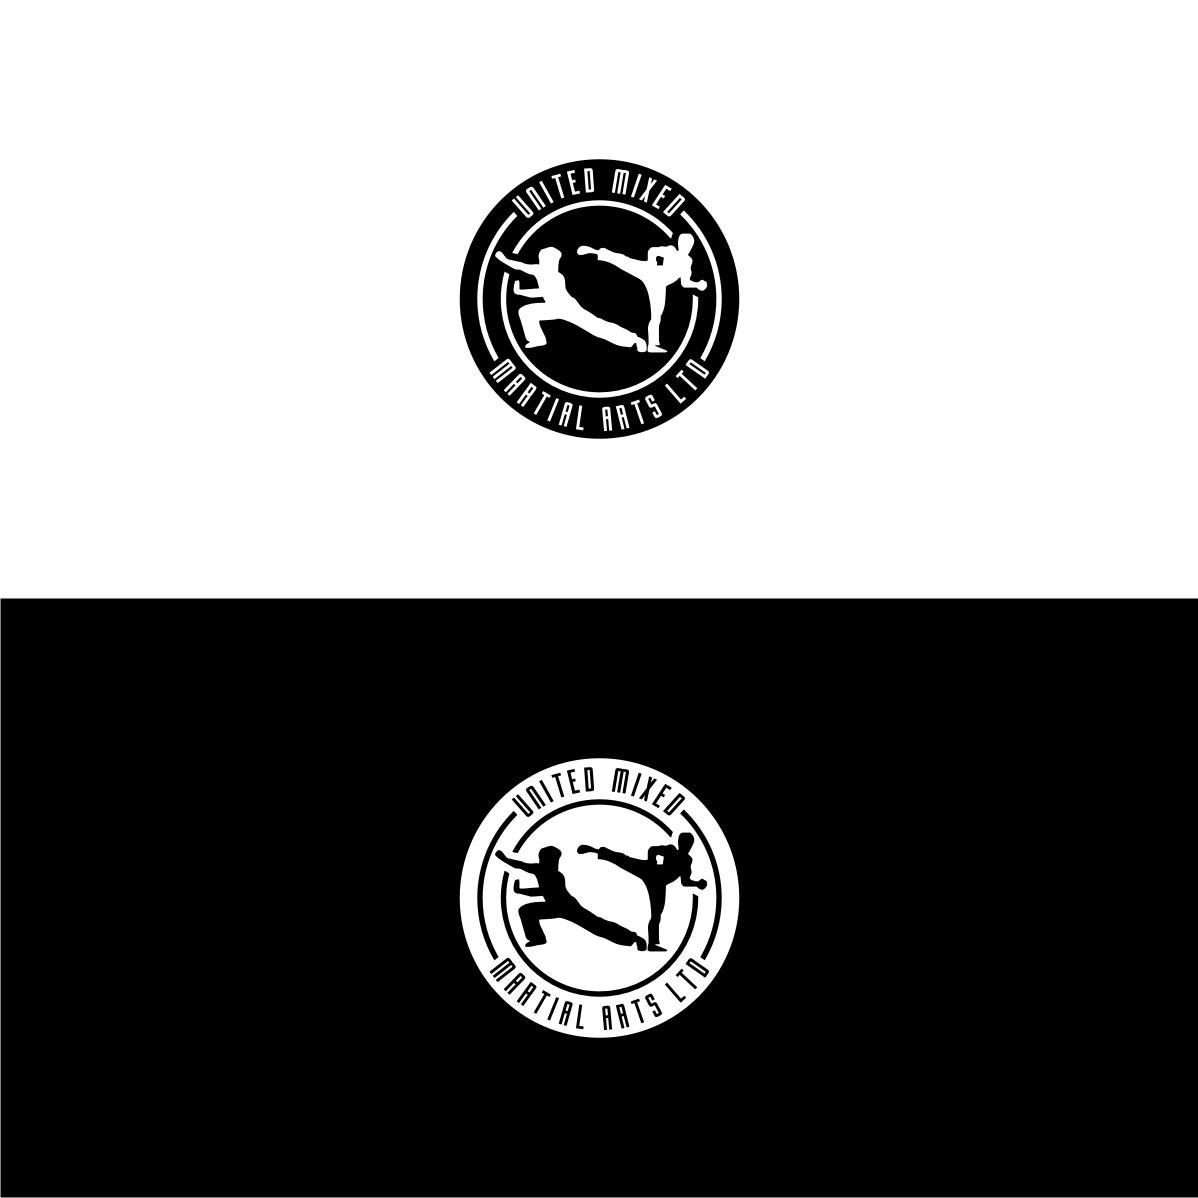 Logo Design by Analla Art - Entry No. 95 in the Logo Design Contest Artistic Logo Design for United Mixed Martial Arts Ltd..